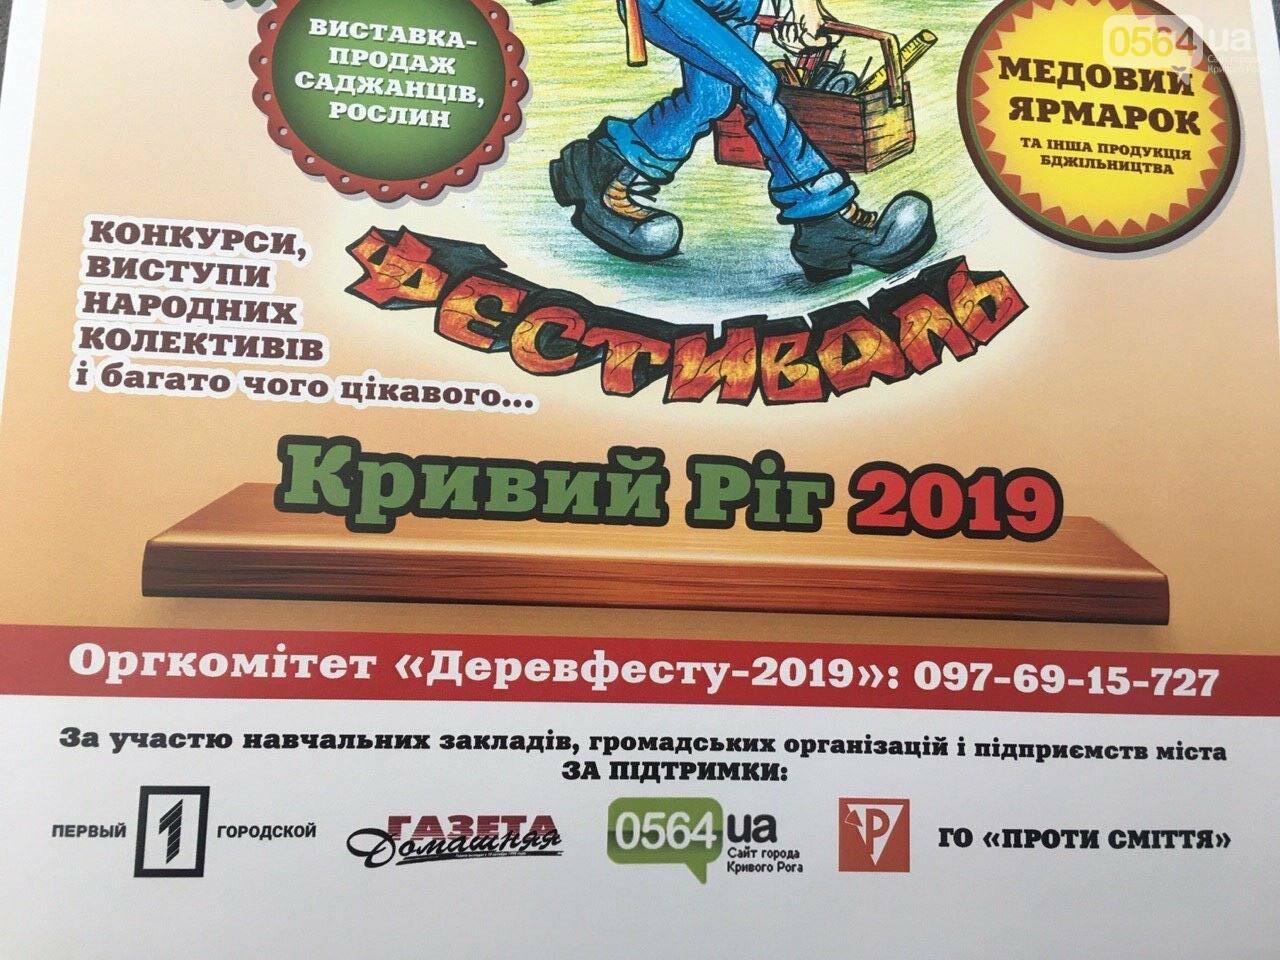 В субботу, 14 сентября, криворожан приглашают на Древофест, - ФОТО, ВИДЕО, фото-6